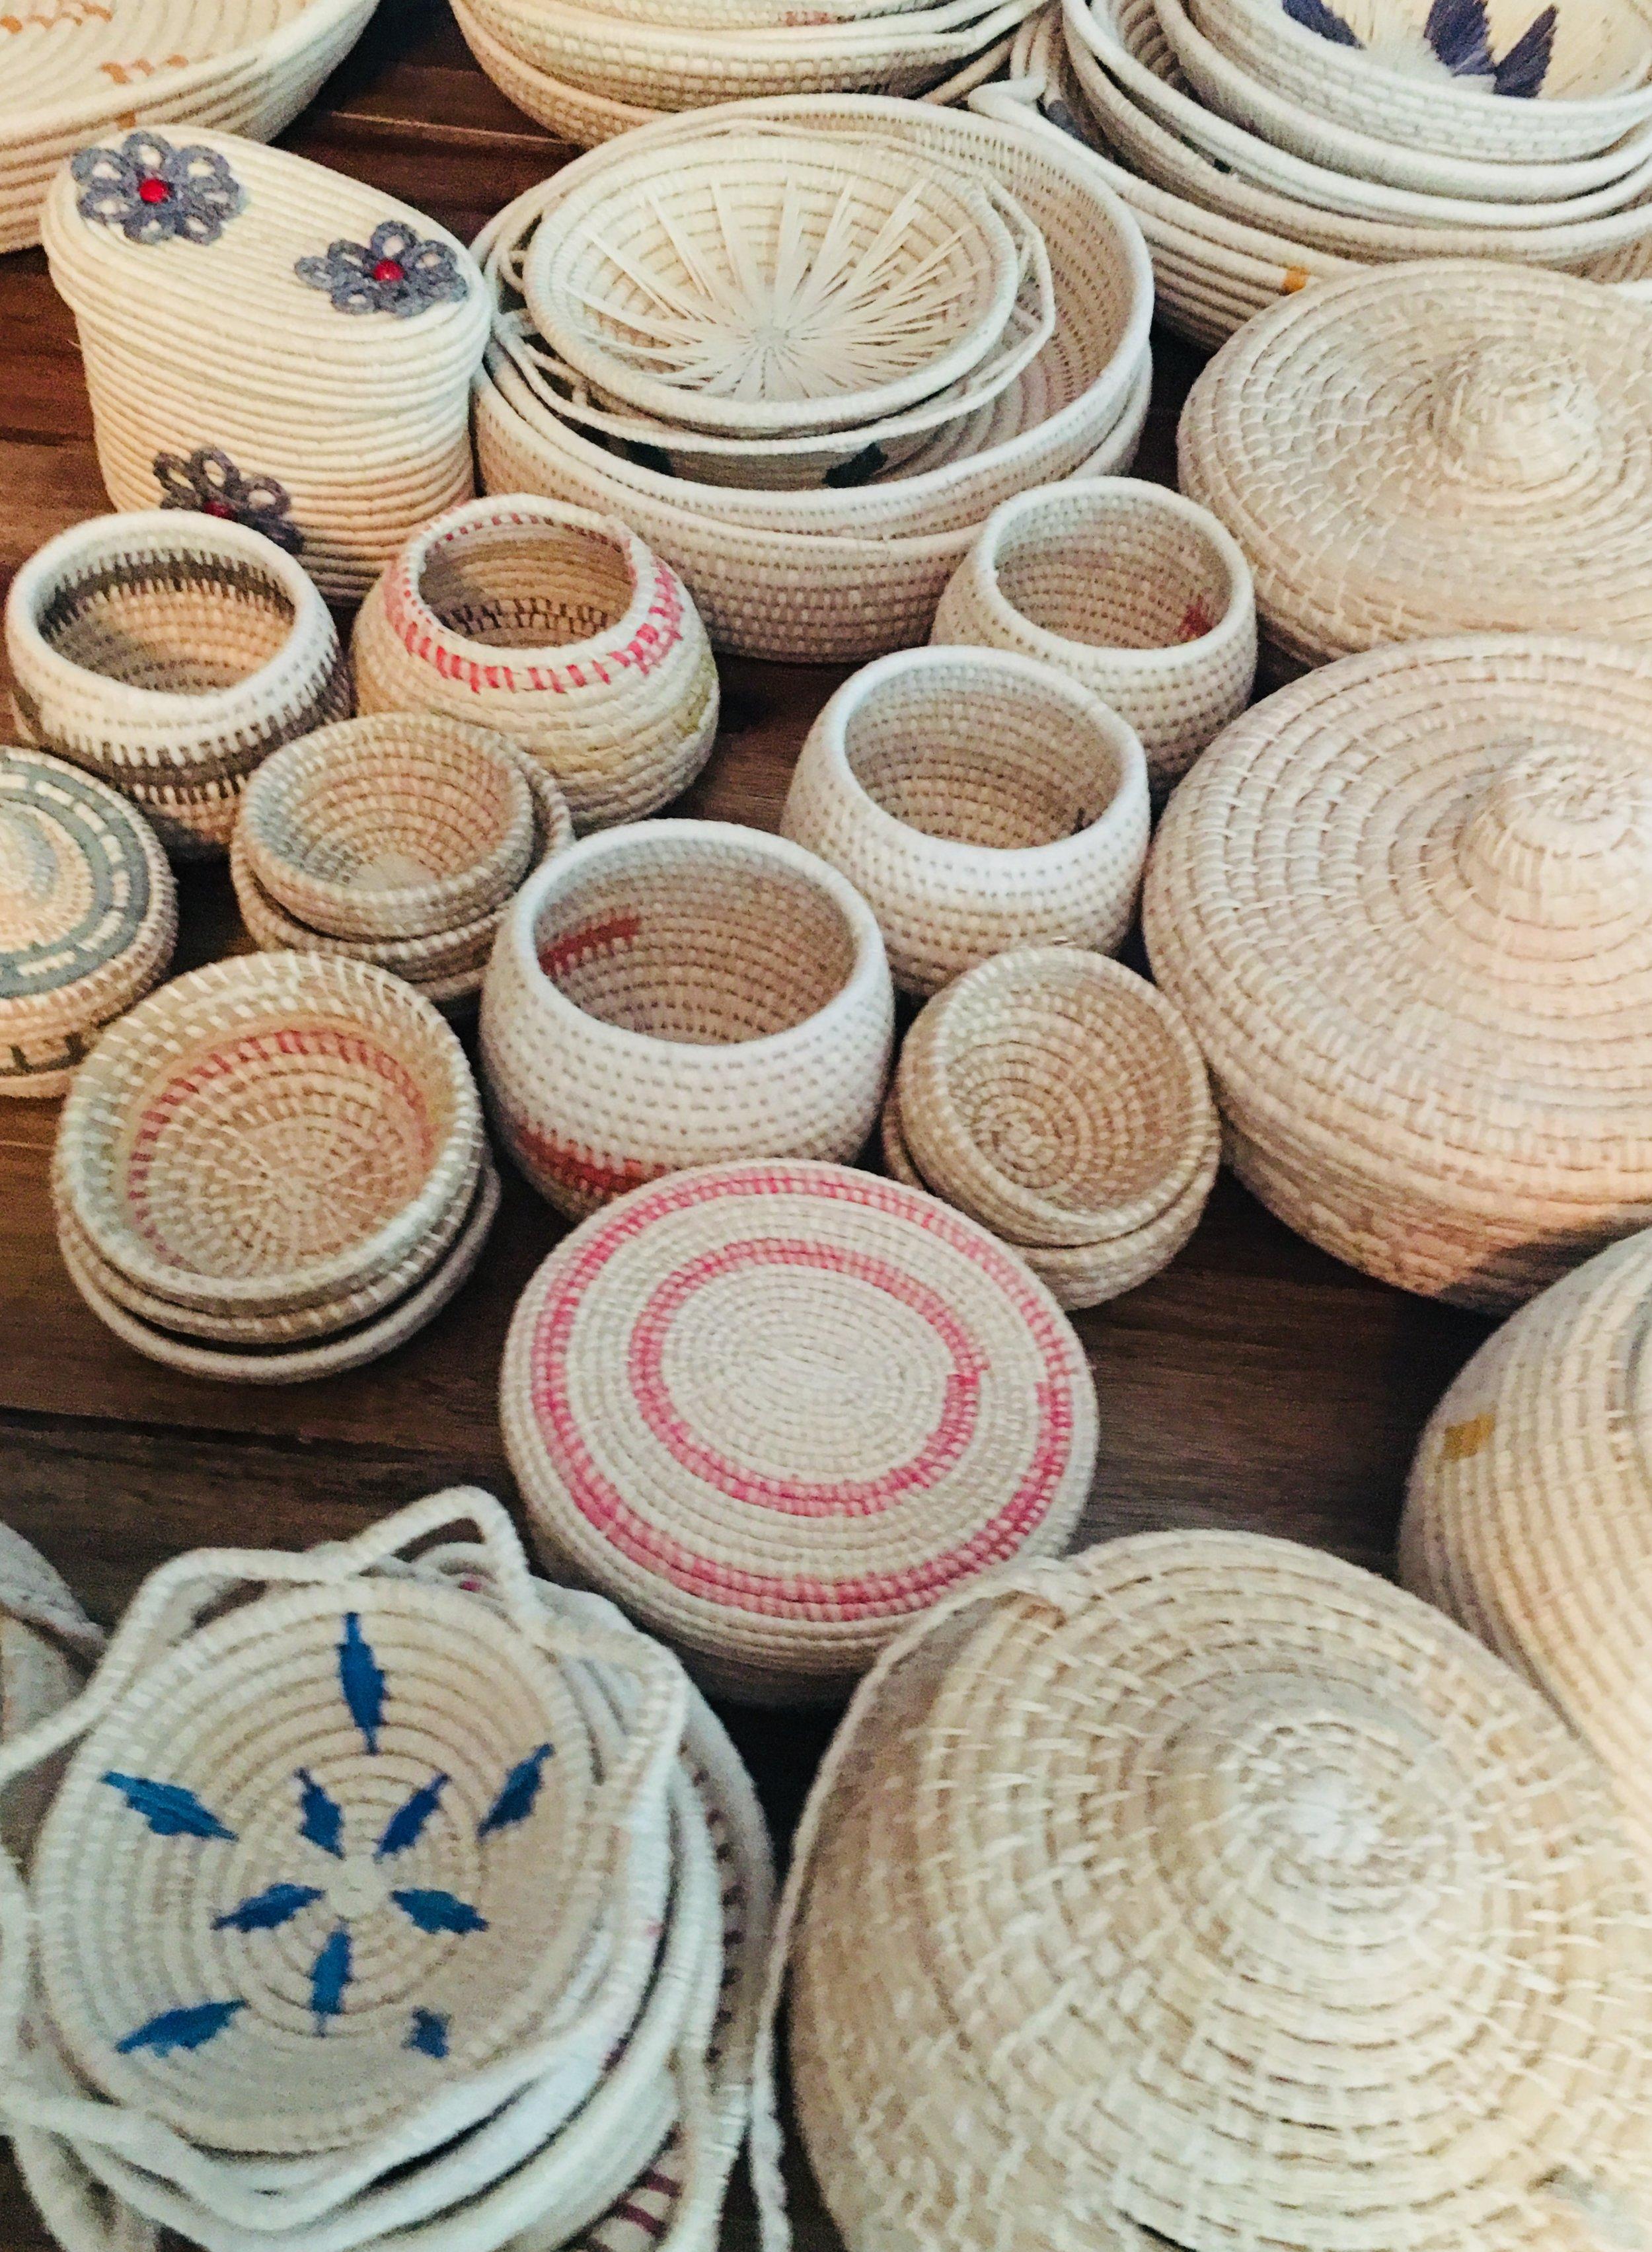 Artepuy - Handmade Craft from Venezuela!!! Warao Indian Baskets (Delta del Orinoco, Venezuela) ECO FRIENDLY and more!!https://www.etsy.com/shop/ArtTepuy